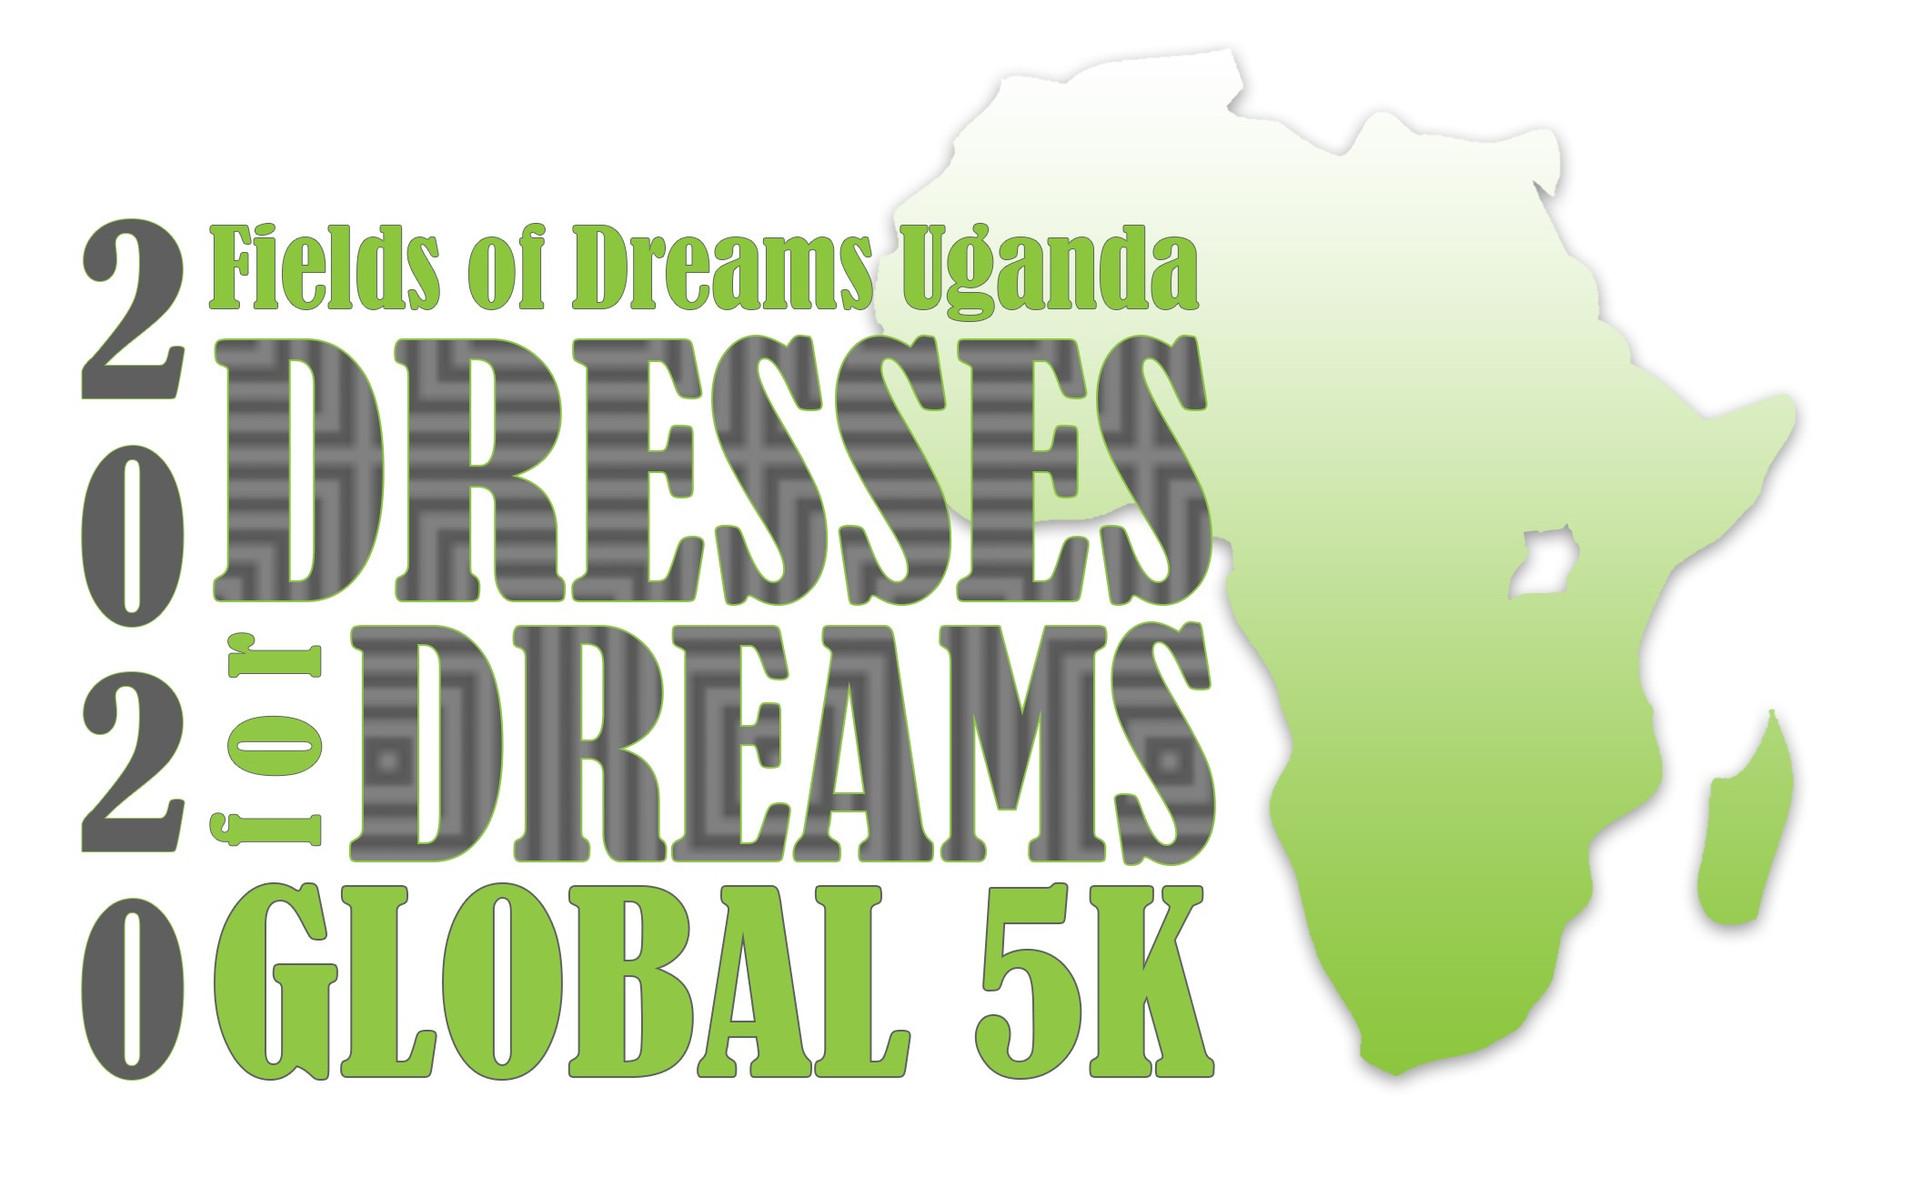 Dresses for Dreams Global 5K » 2020